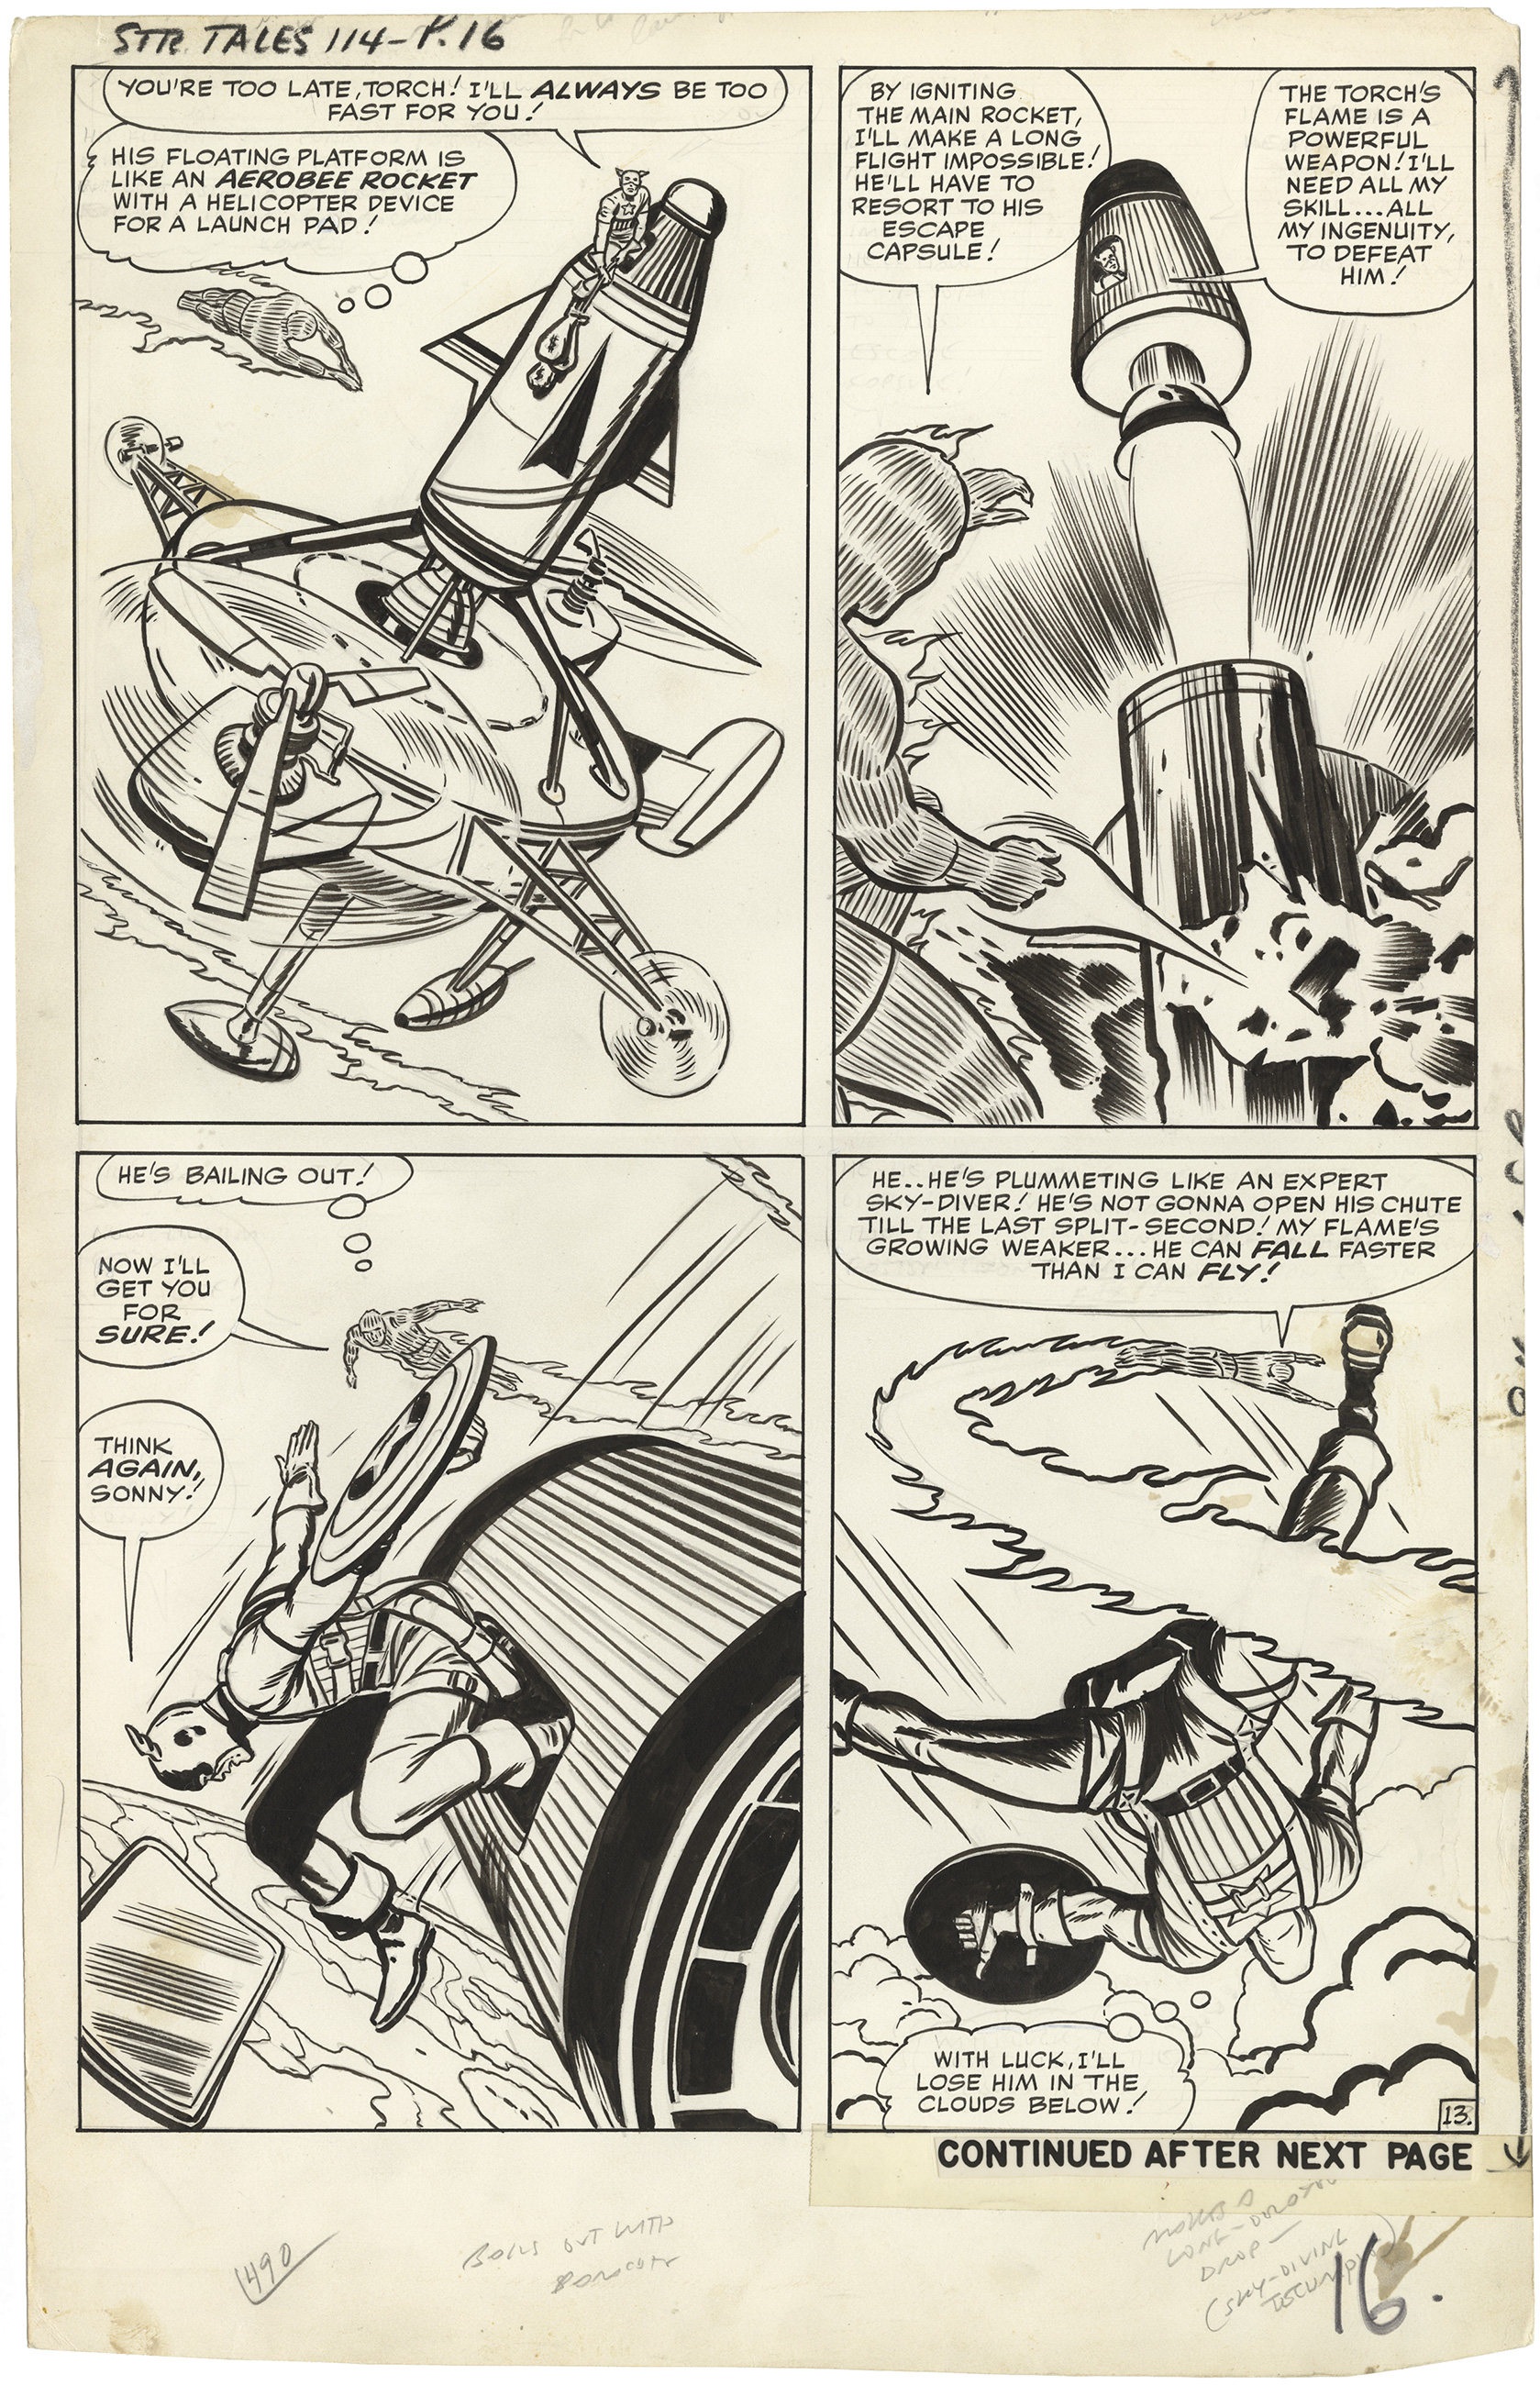 Strange Tales #114 p13 (Large Art - First Cap)